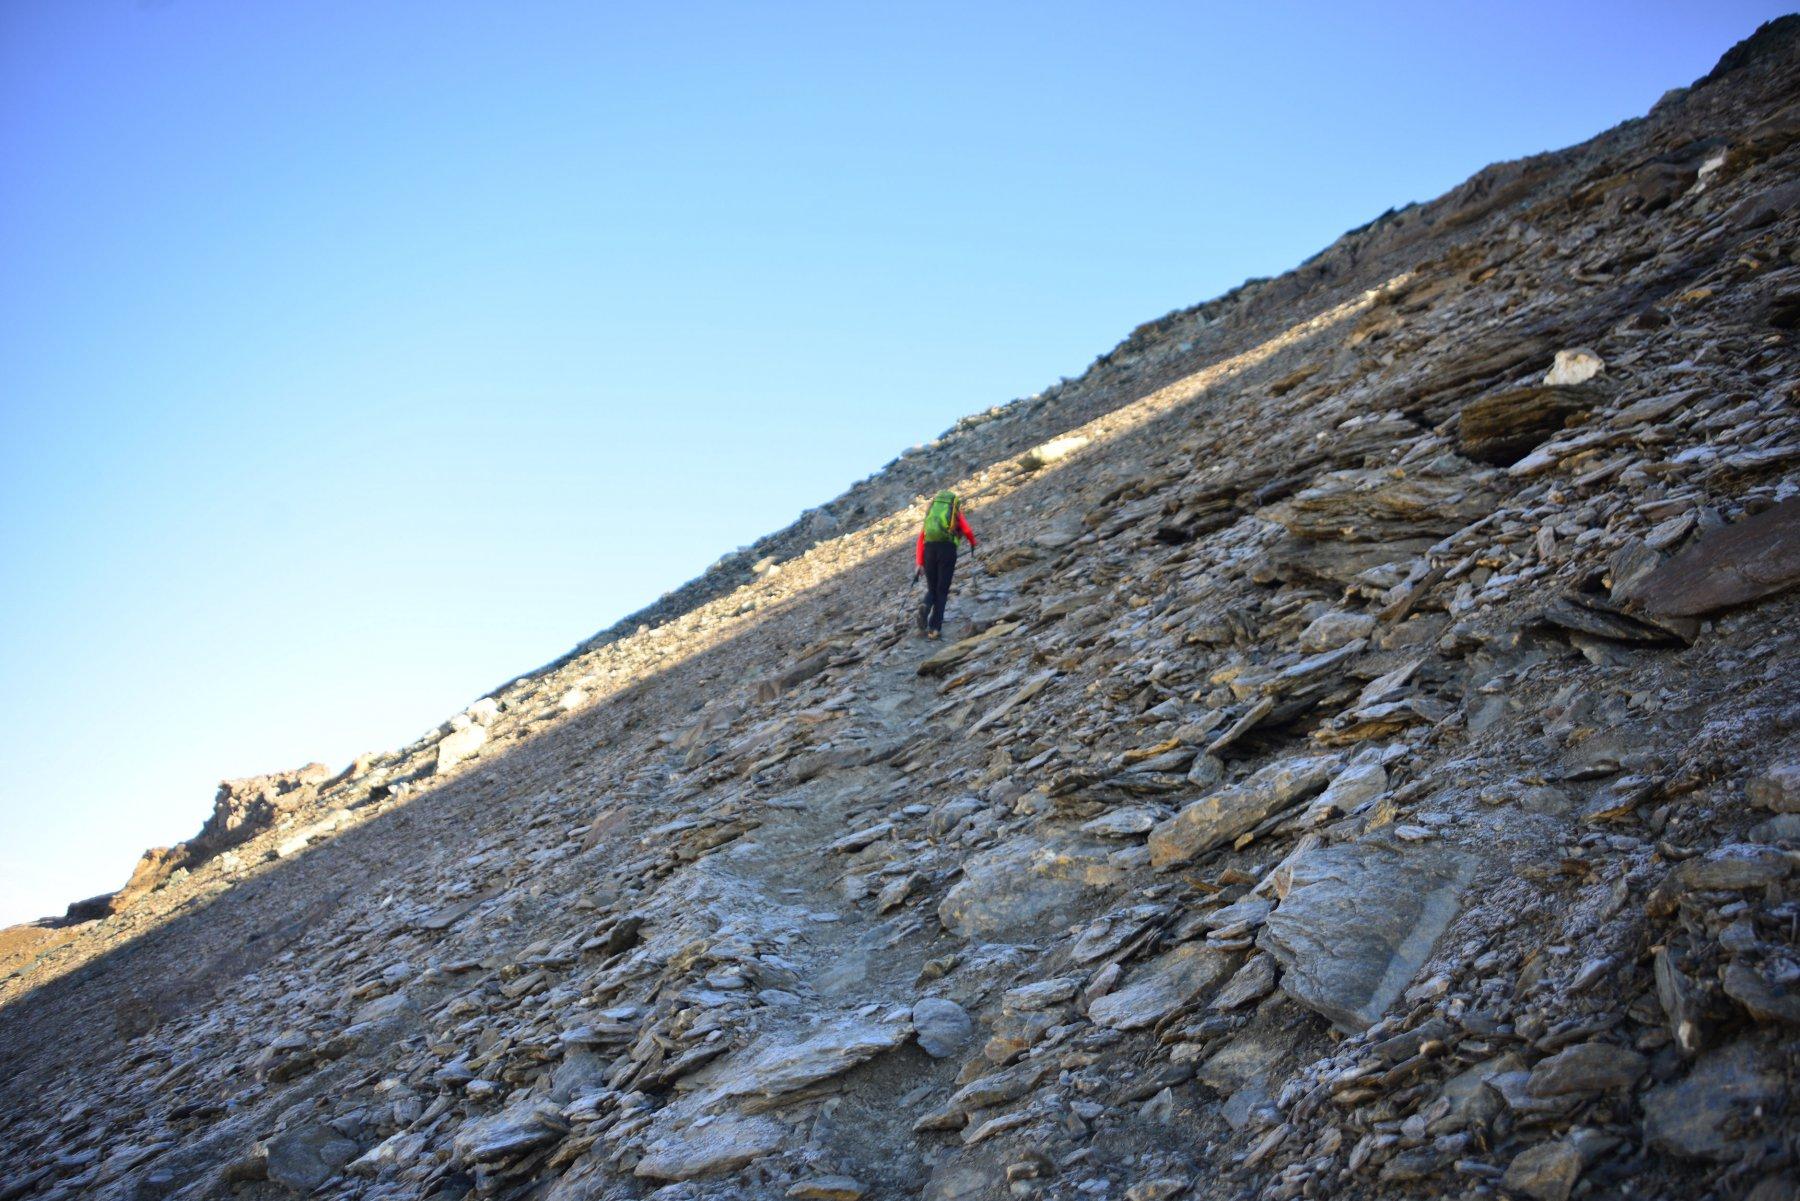 salita canalone sopra al ghiacciaio